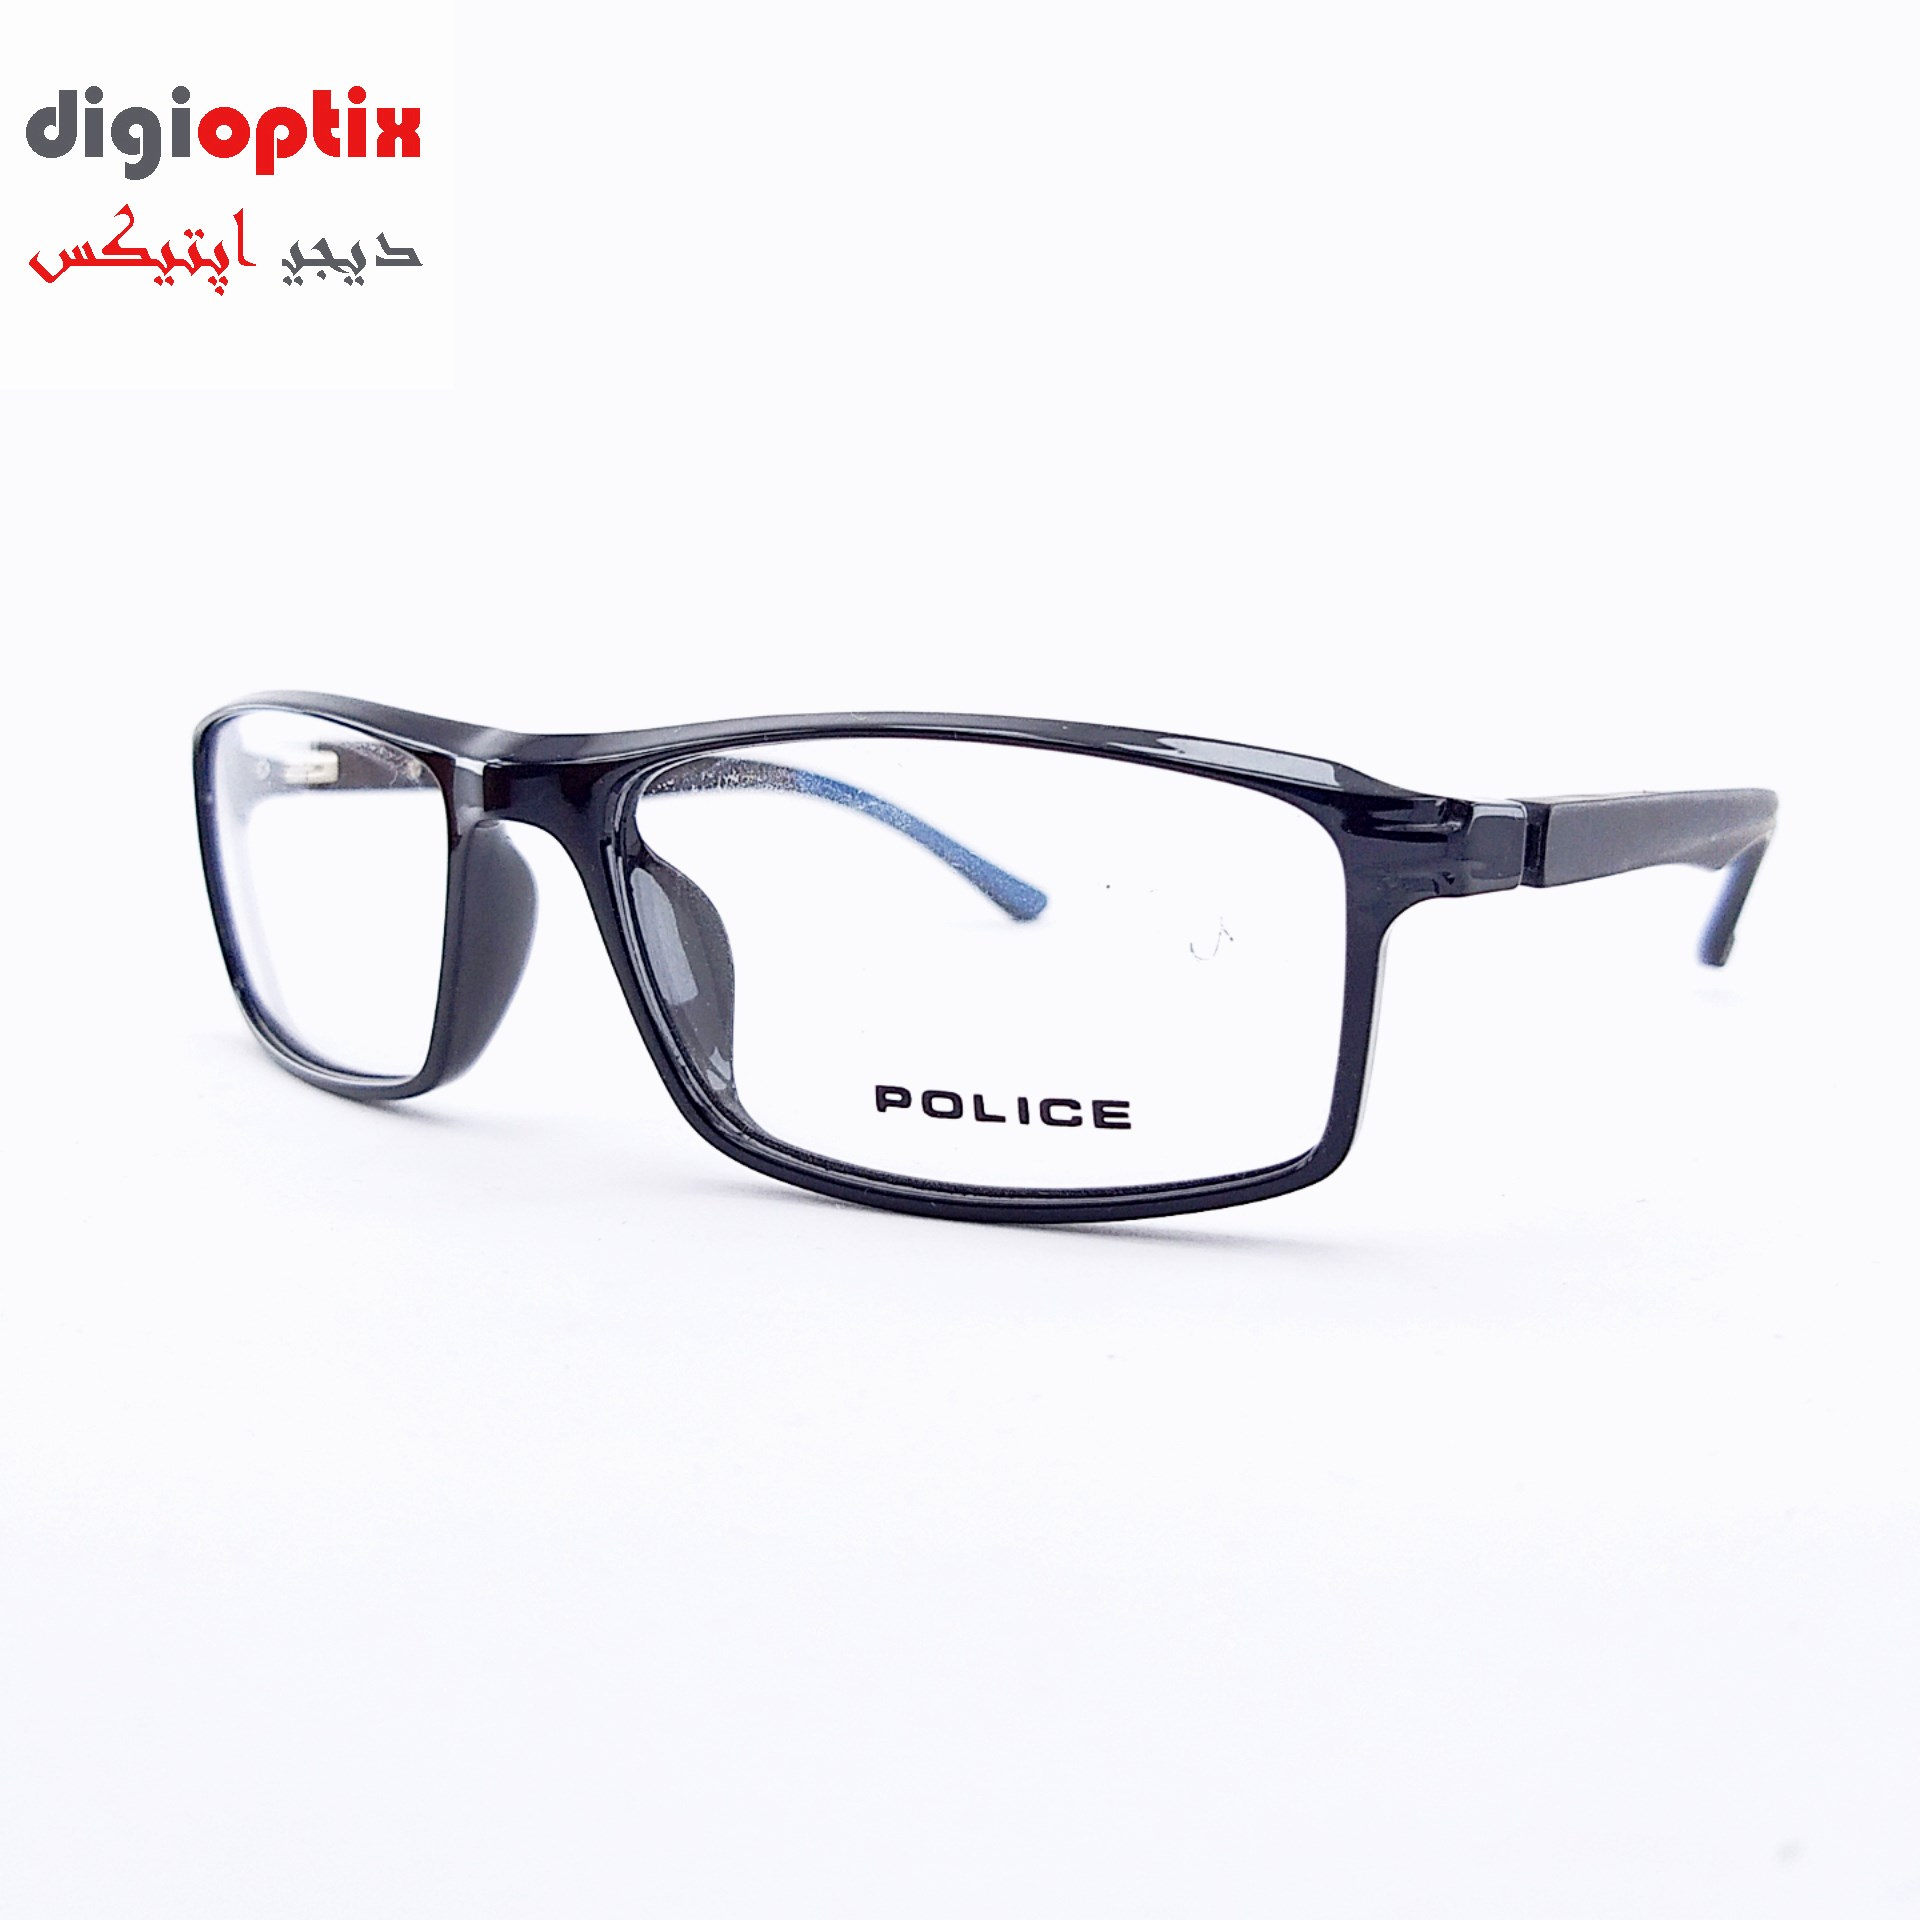 فریم عینک طبی اسپورت مارک POLICE رنگ مشکی براق مدل H86